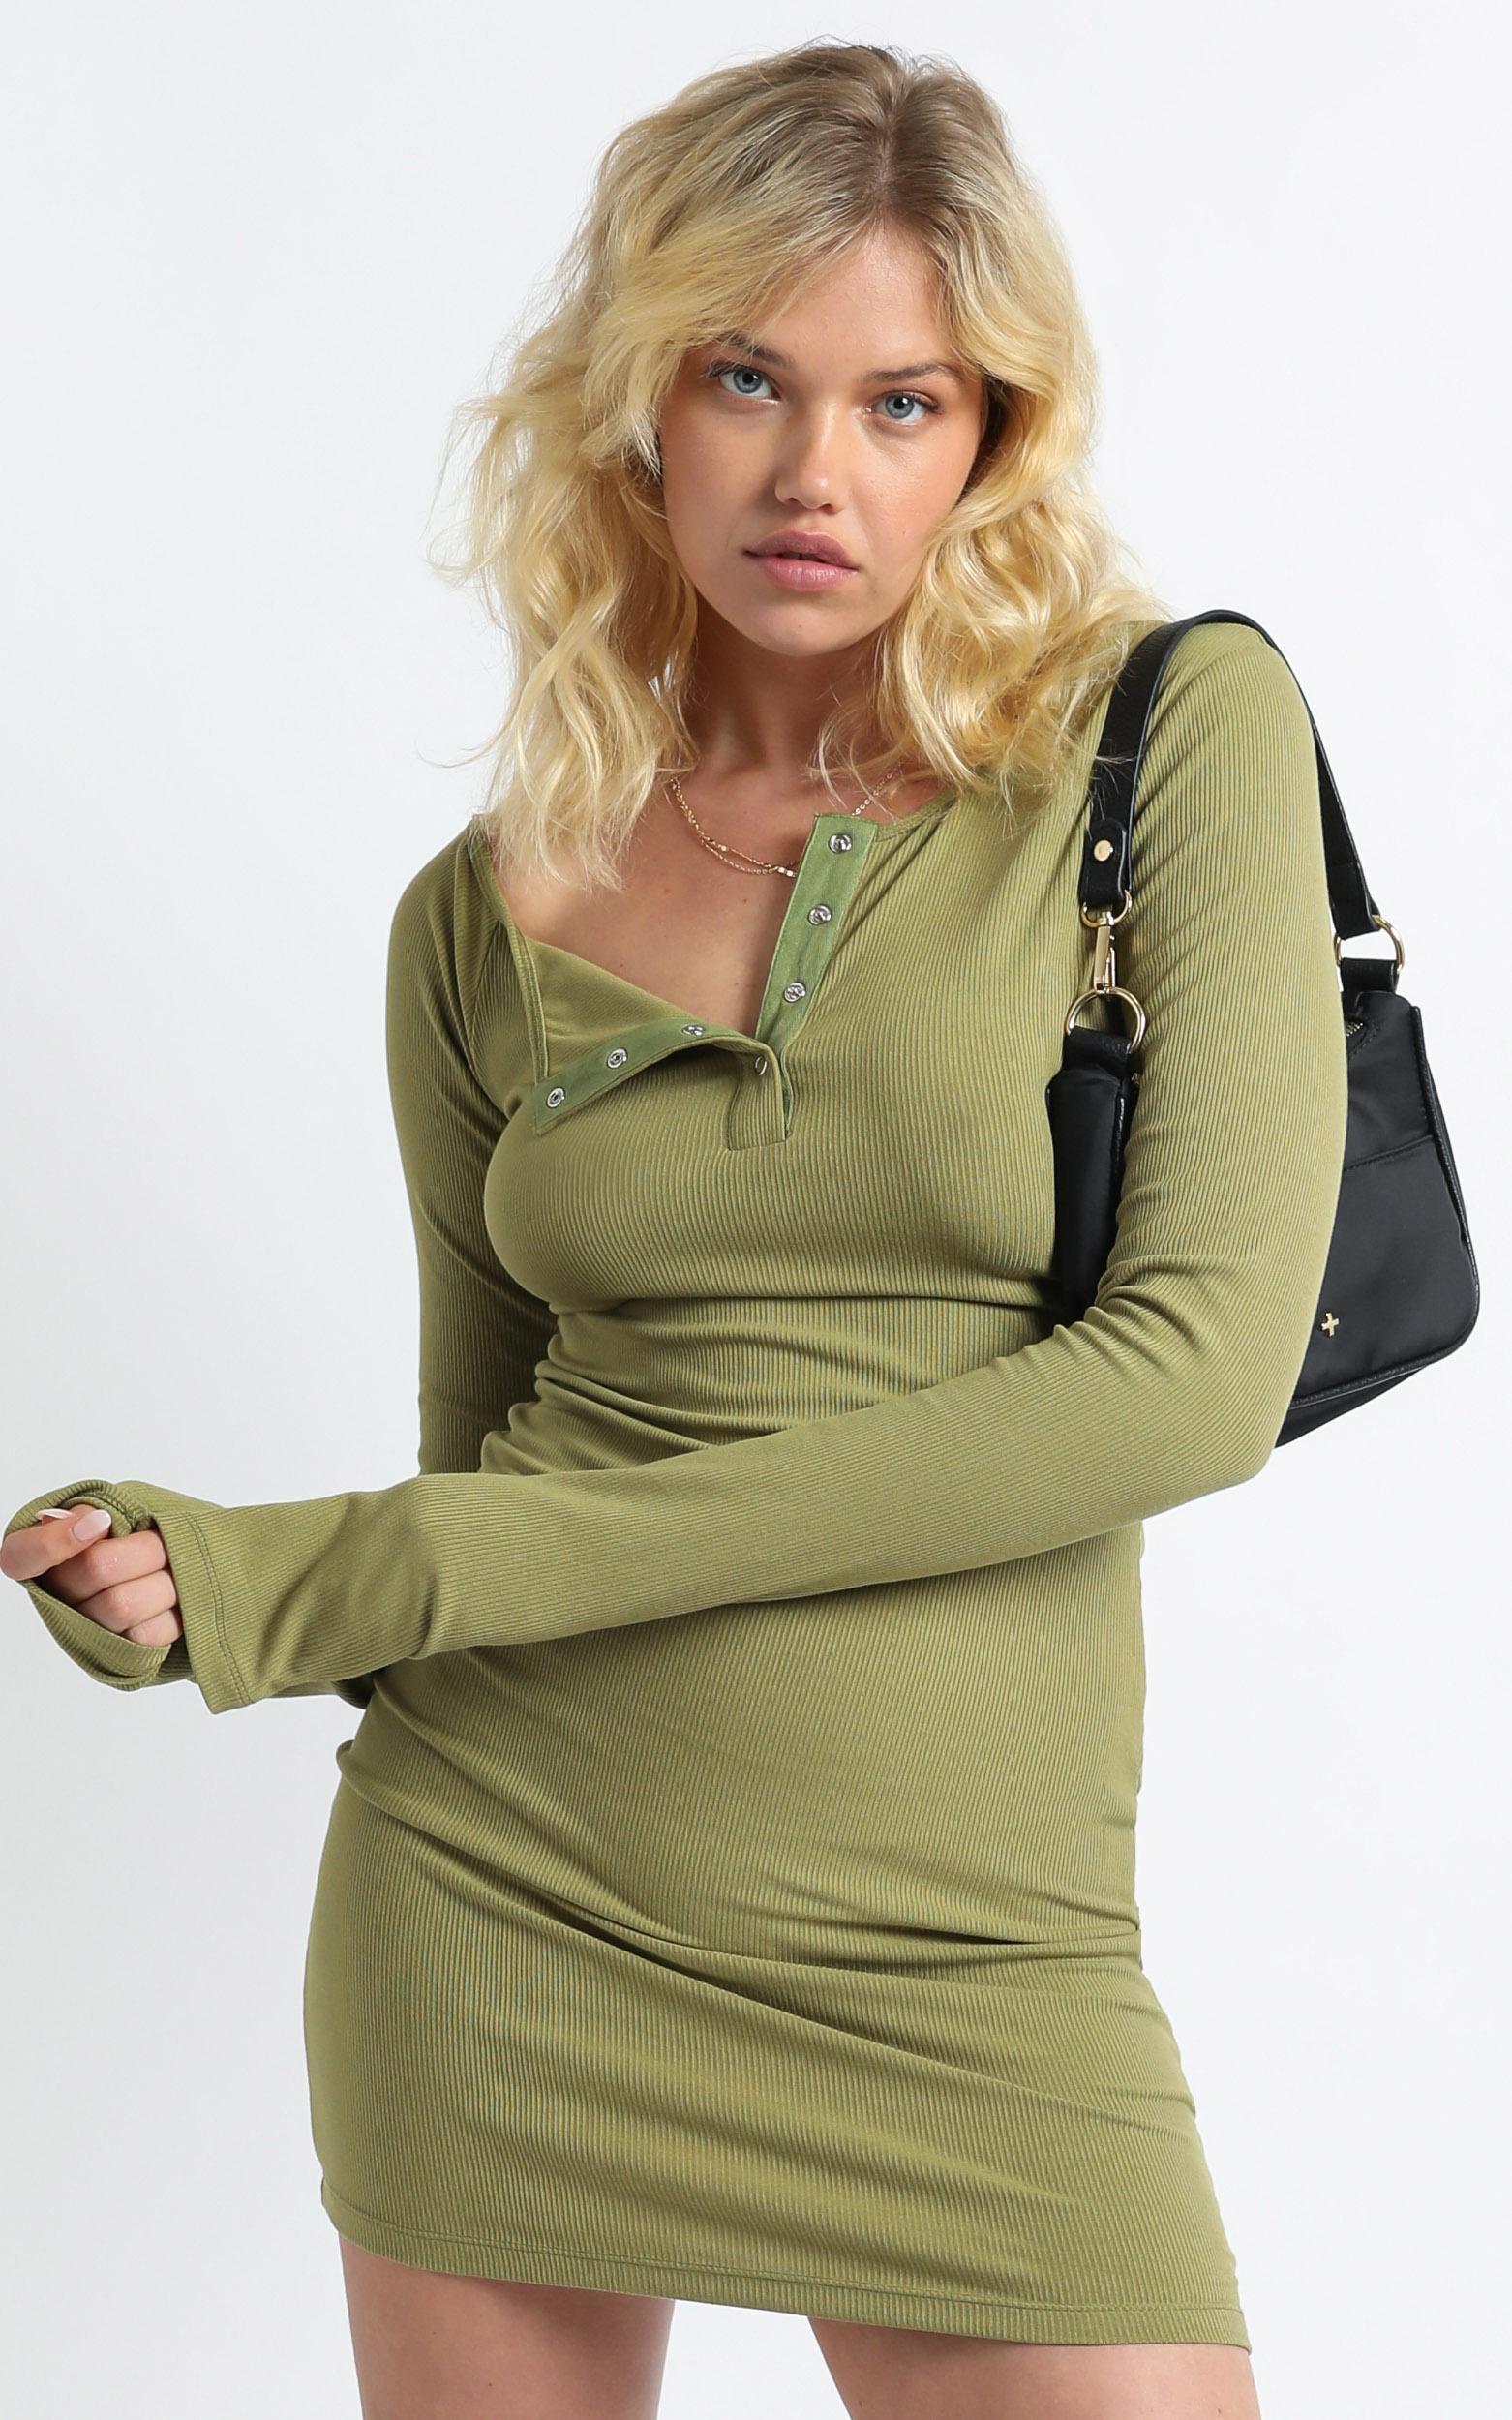 Lioness - Gramercy Mini Dress in Khaki - 4 (XXS), Khaki, hi-res image number null